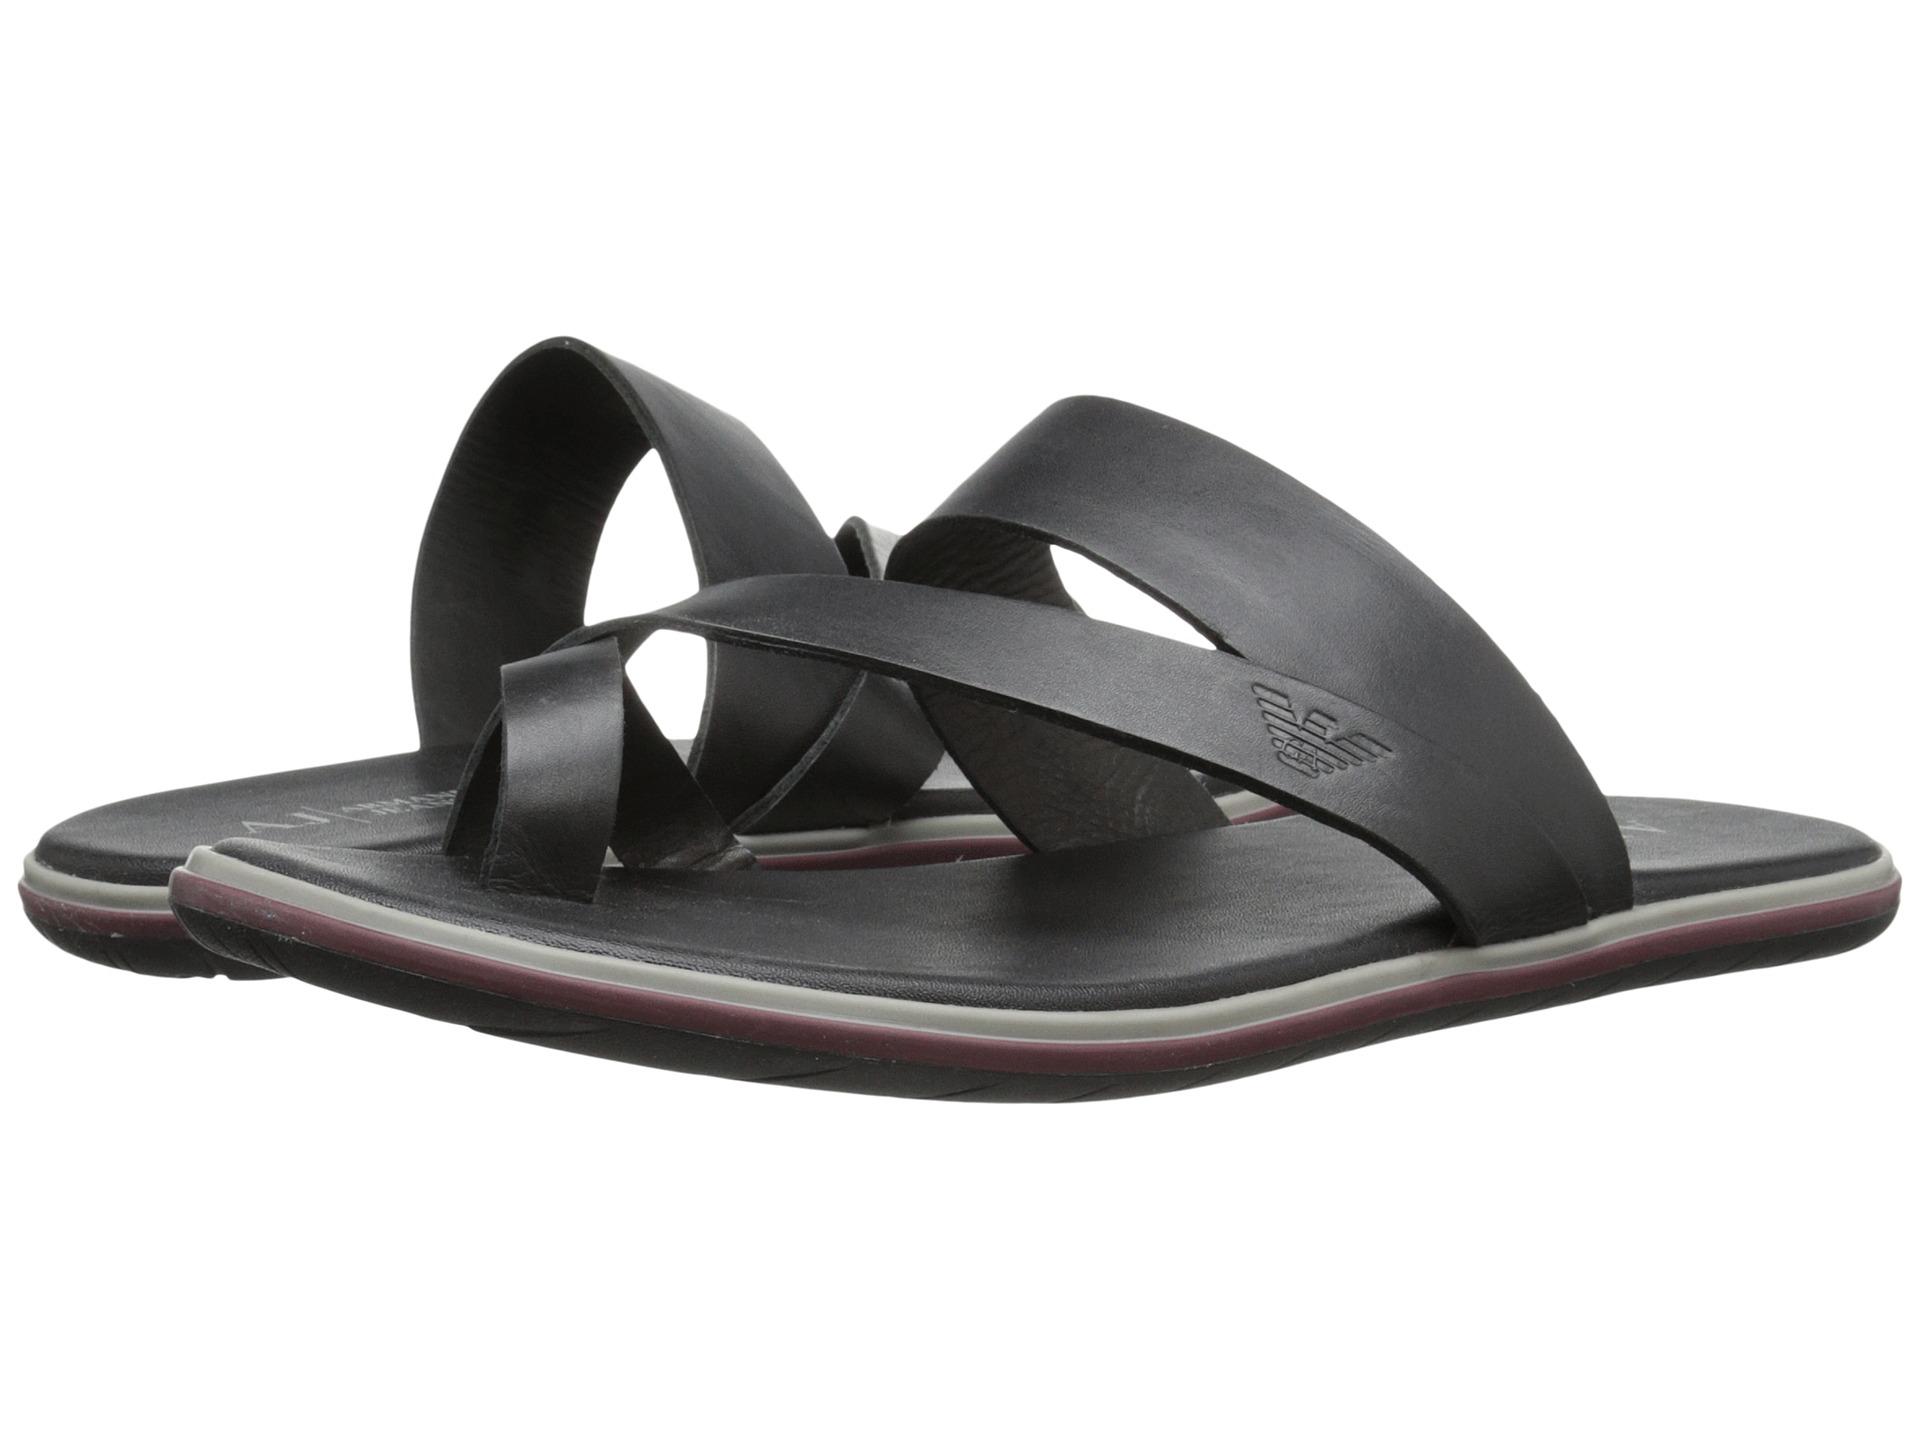 6efbde9614f9e Lyst - Armani Jeans Toe Lock Sandal in Black for Men